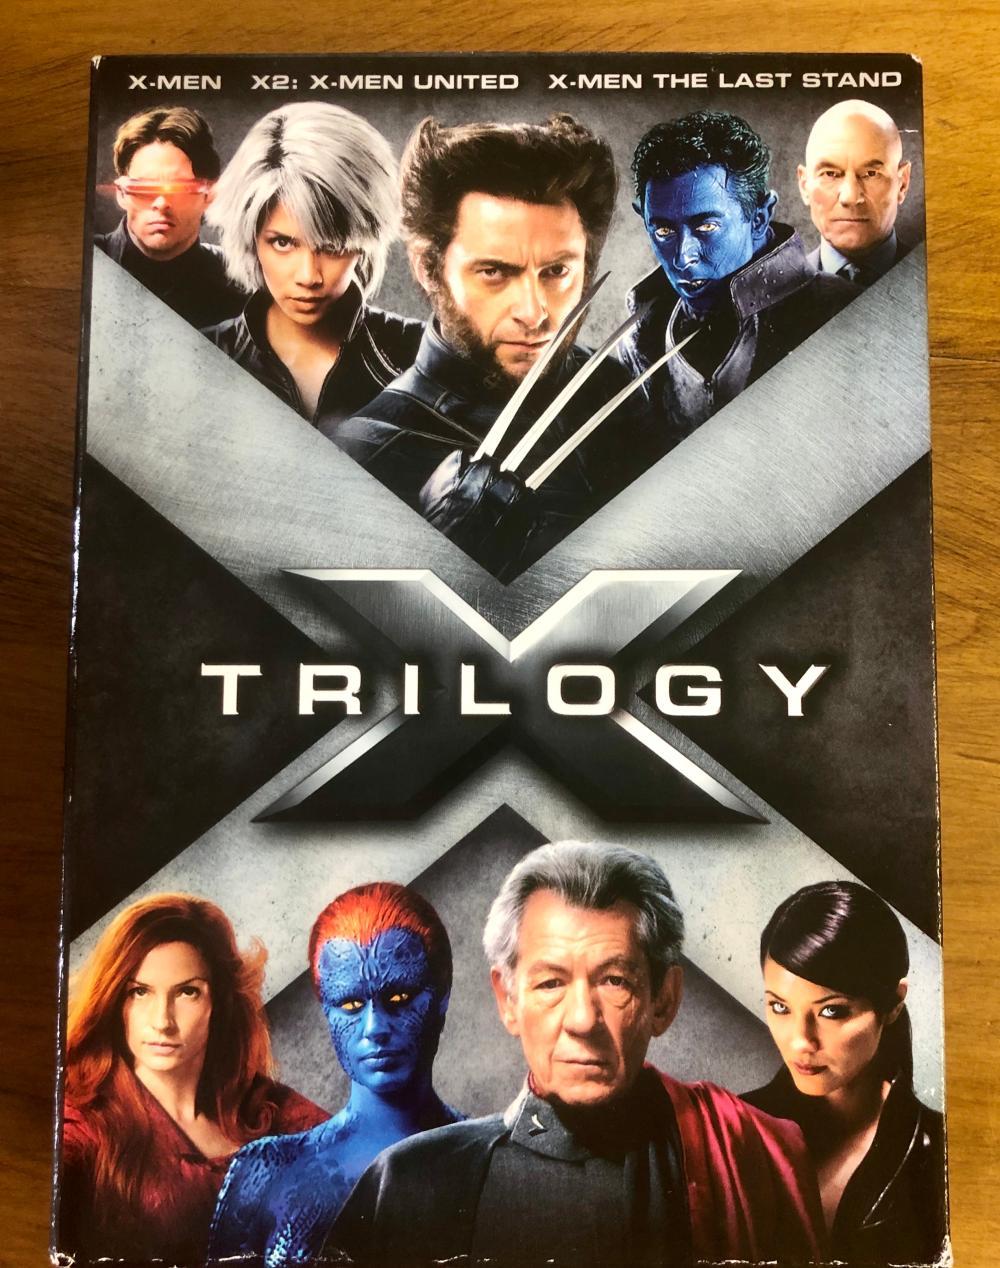 2006 X-MEN TRILOGY MARVEL & 20TH CENTURY FOX (3) DVD SET